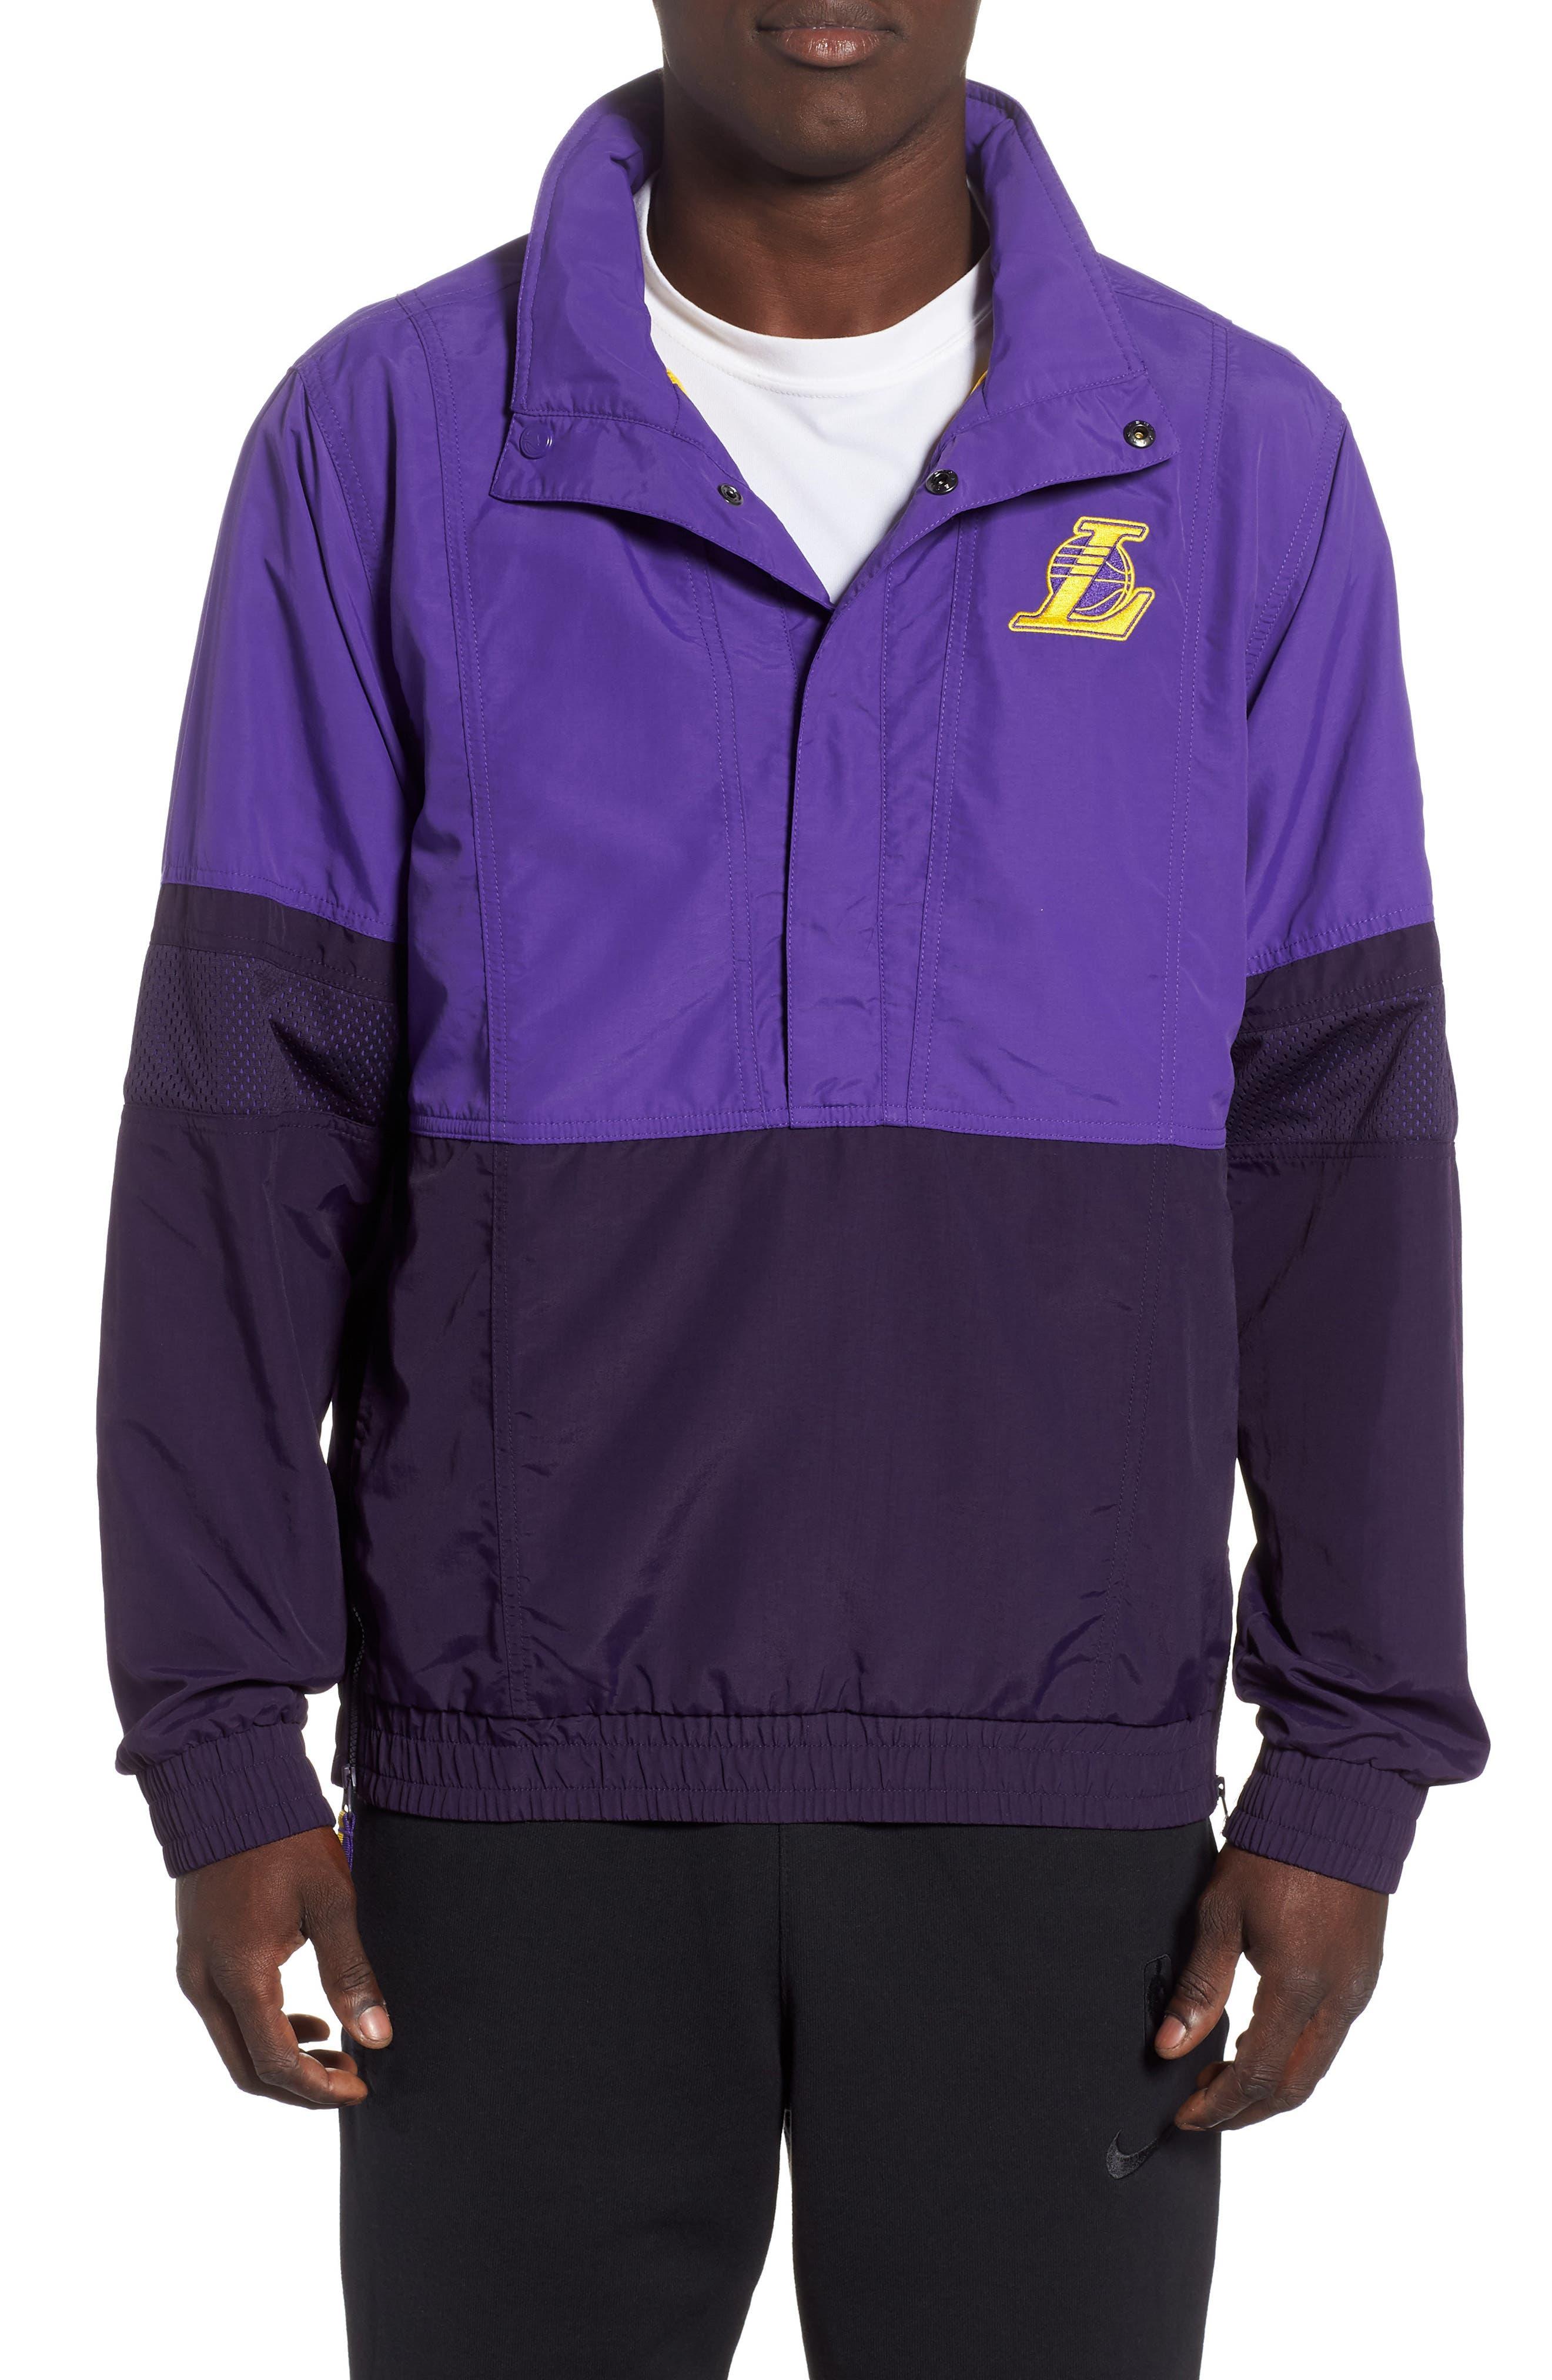 Los Angeles Lakers Courtside Warm-Up Jacket,                             Main thumbnail 1, color,                             FIELD PURPLE/PURPLE/ AMARILLO